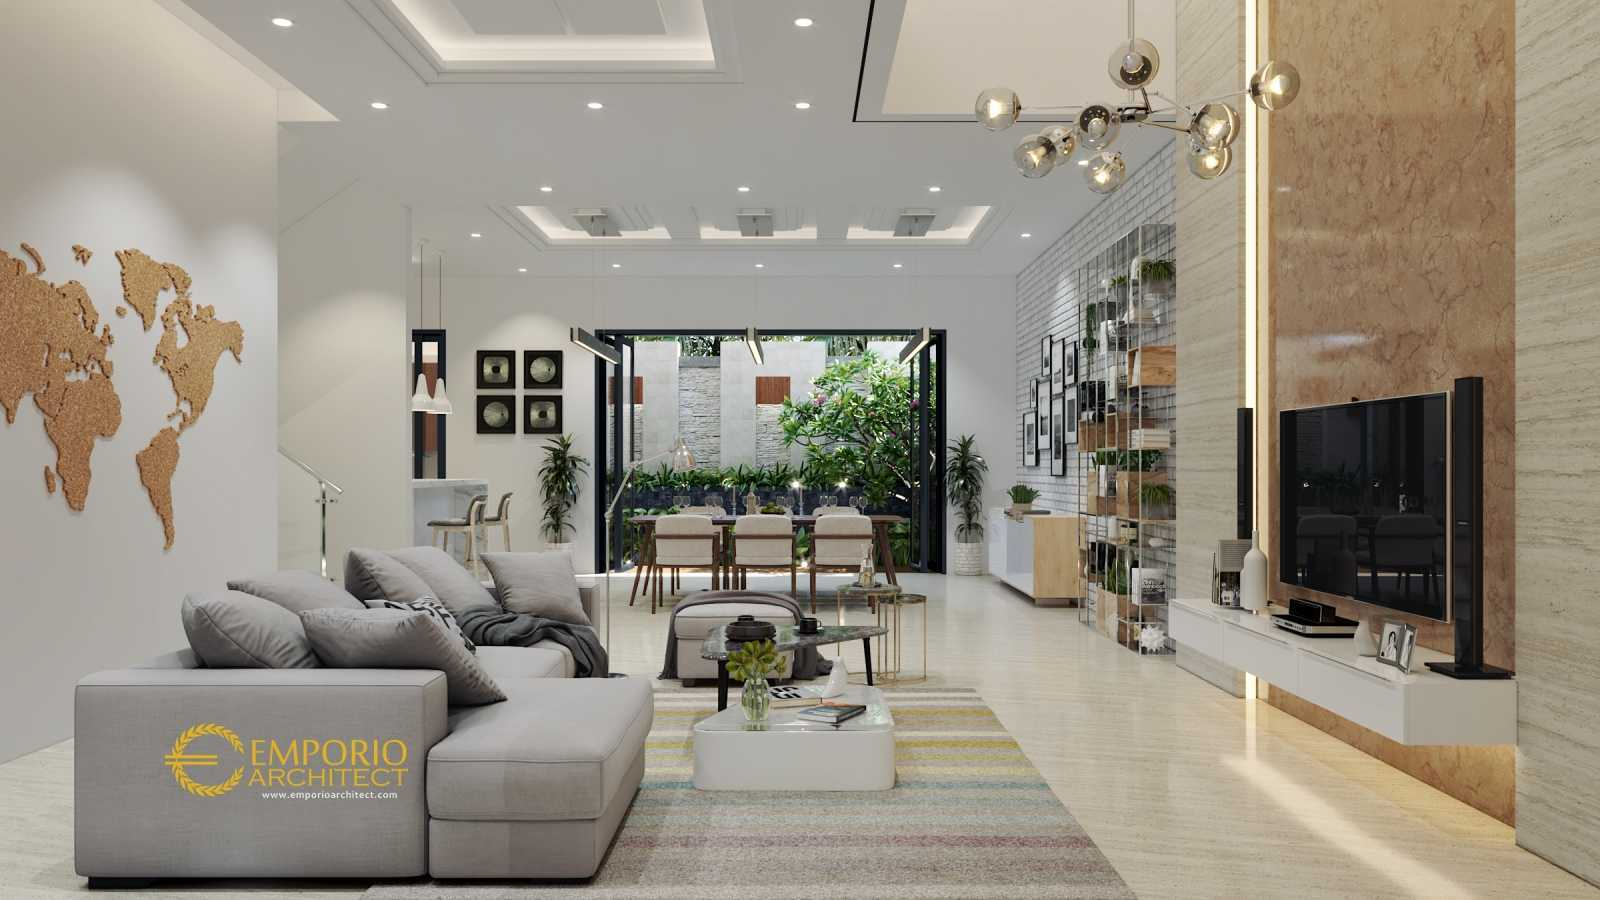 Emporio Architect Desain Rumah Modern Tropis 575 @ Jakarta Utara Jakarta Utara, Kota Jkt Utara, Daerah Khusus Ibukota Jakarta, Indonesia Jakarta Utara, Kota Jkt Utara, Daerah Khusus Ibukota Jakarta, Indonesia Emporio-Architect-Desain-Rumah-Modern-Tropis-575-Jakarta-Utara  74342